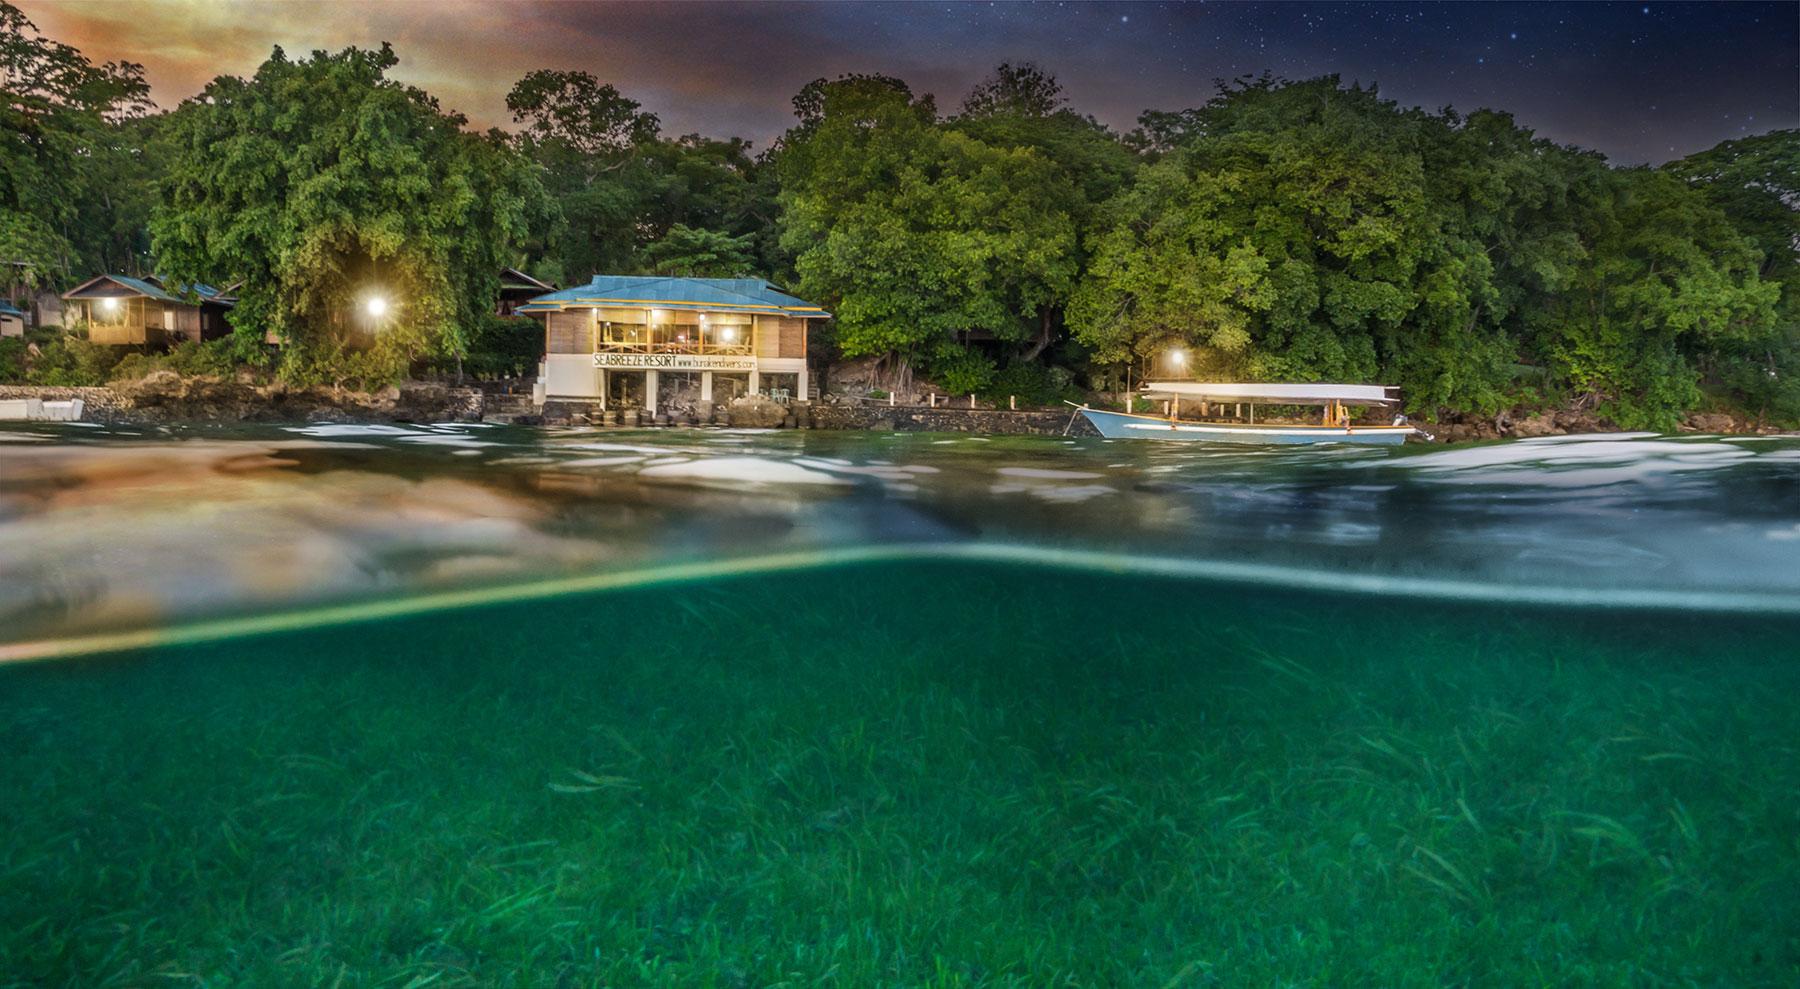 Indonesia, Manado, Bunaken Island, Seabreeze Resort, Restaurant with Boat at Night